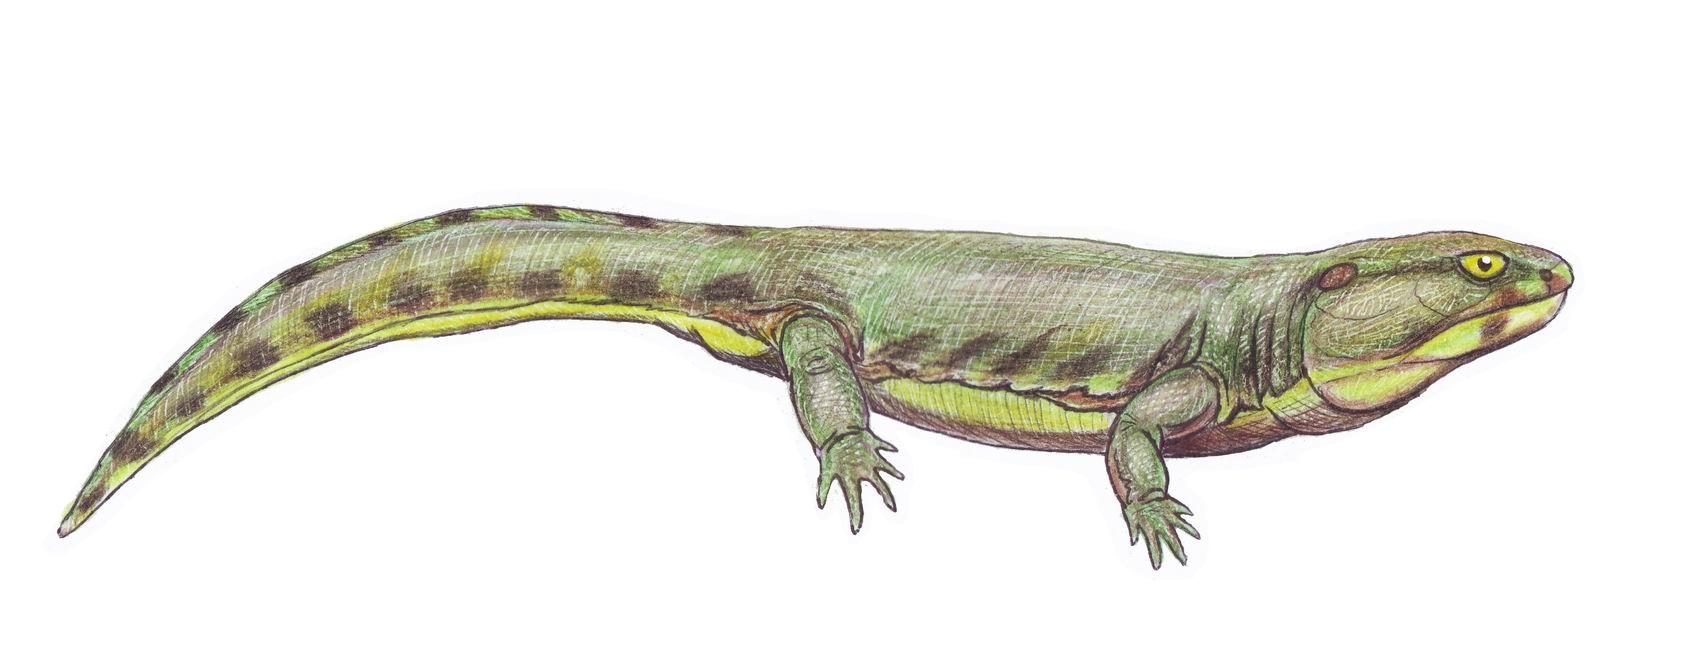 Depiction of Karpinskiosaurus